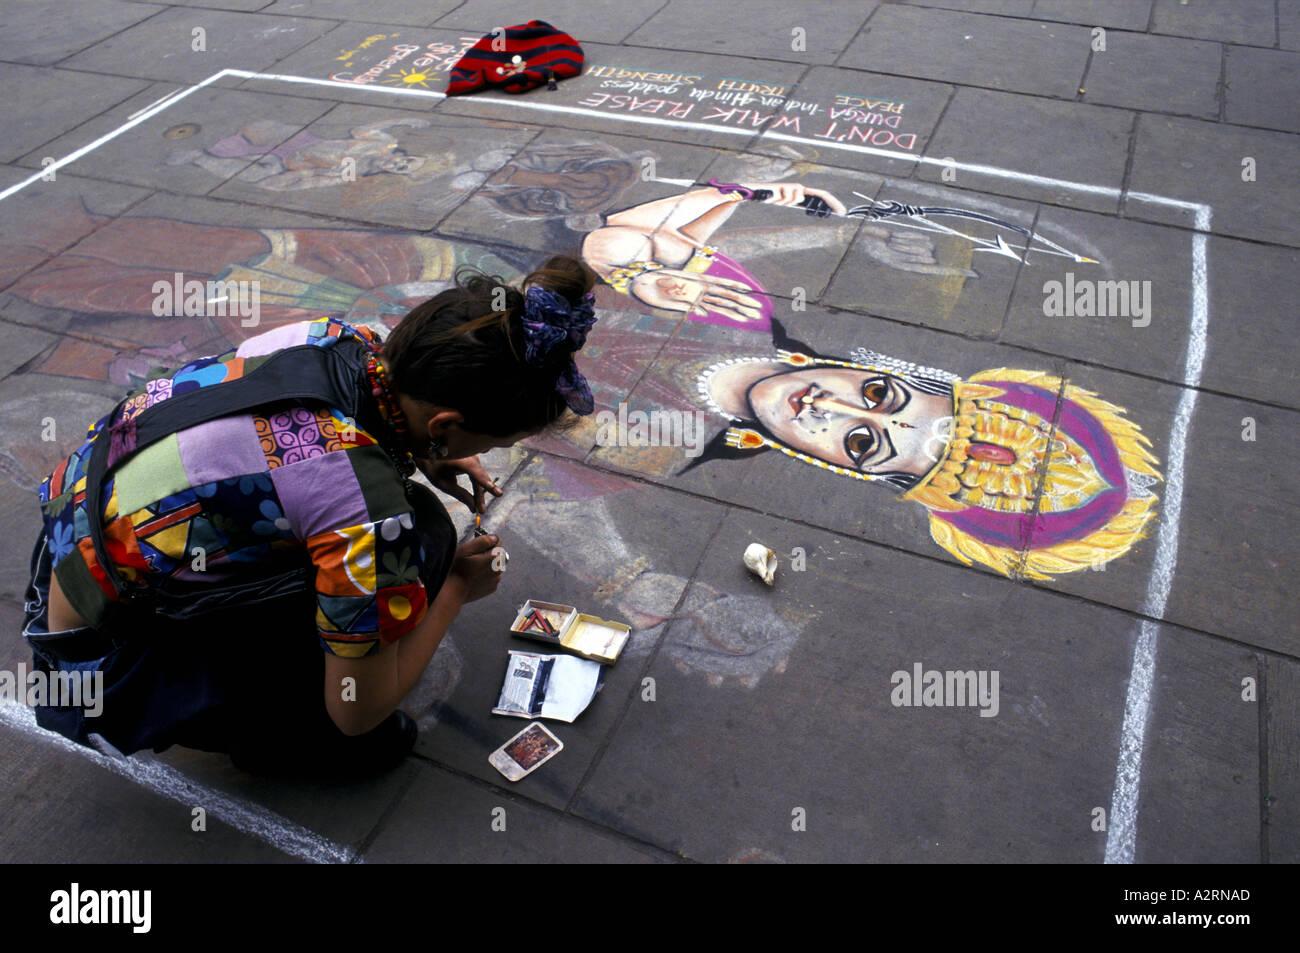 Streetart-Künstler zeichnen auf Bürgersteig Edinburgh Fringe Festival Stockbild